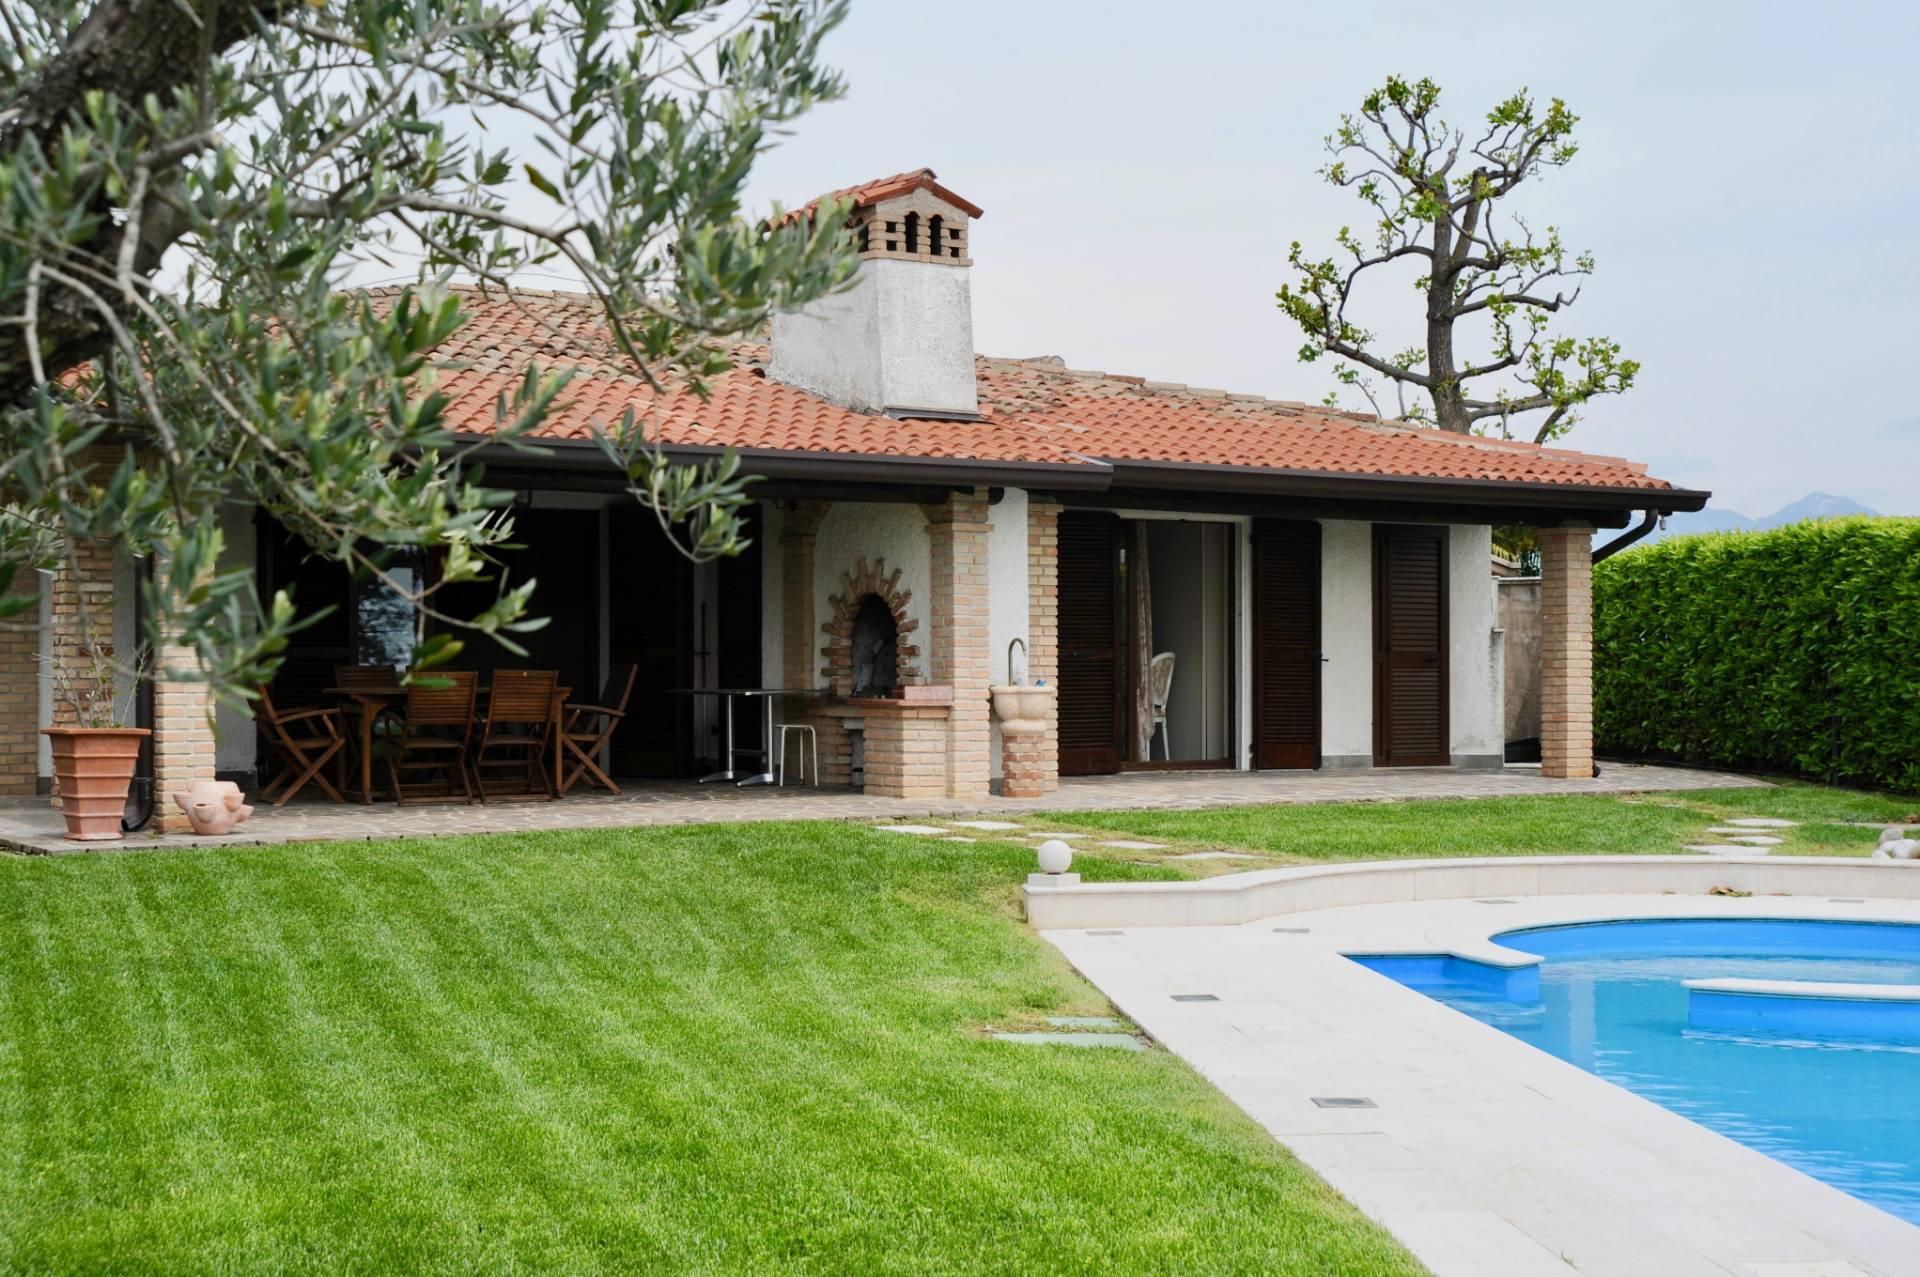 Villa in Vendita a Padenghe Sul Garda: 3 locali, 100 mq - Foto 20